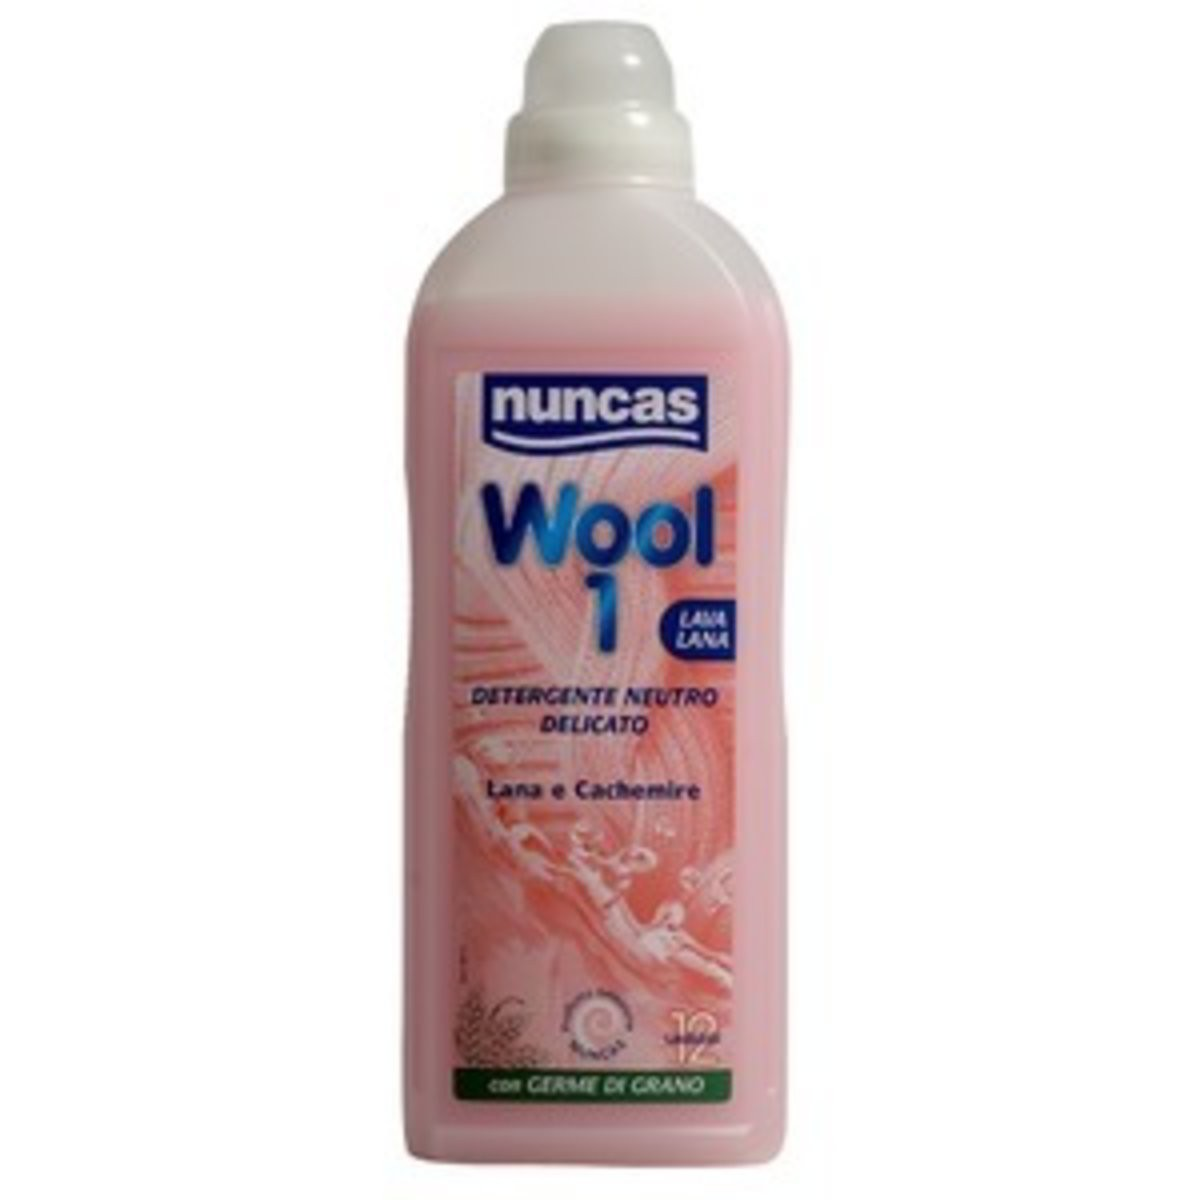 Nuncas Detergente neutro delicato Wool 1